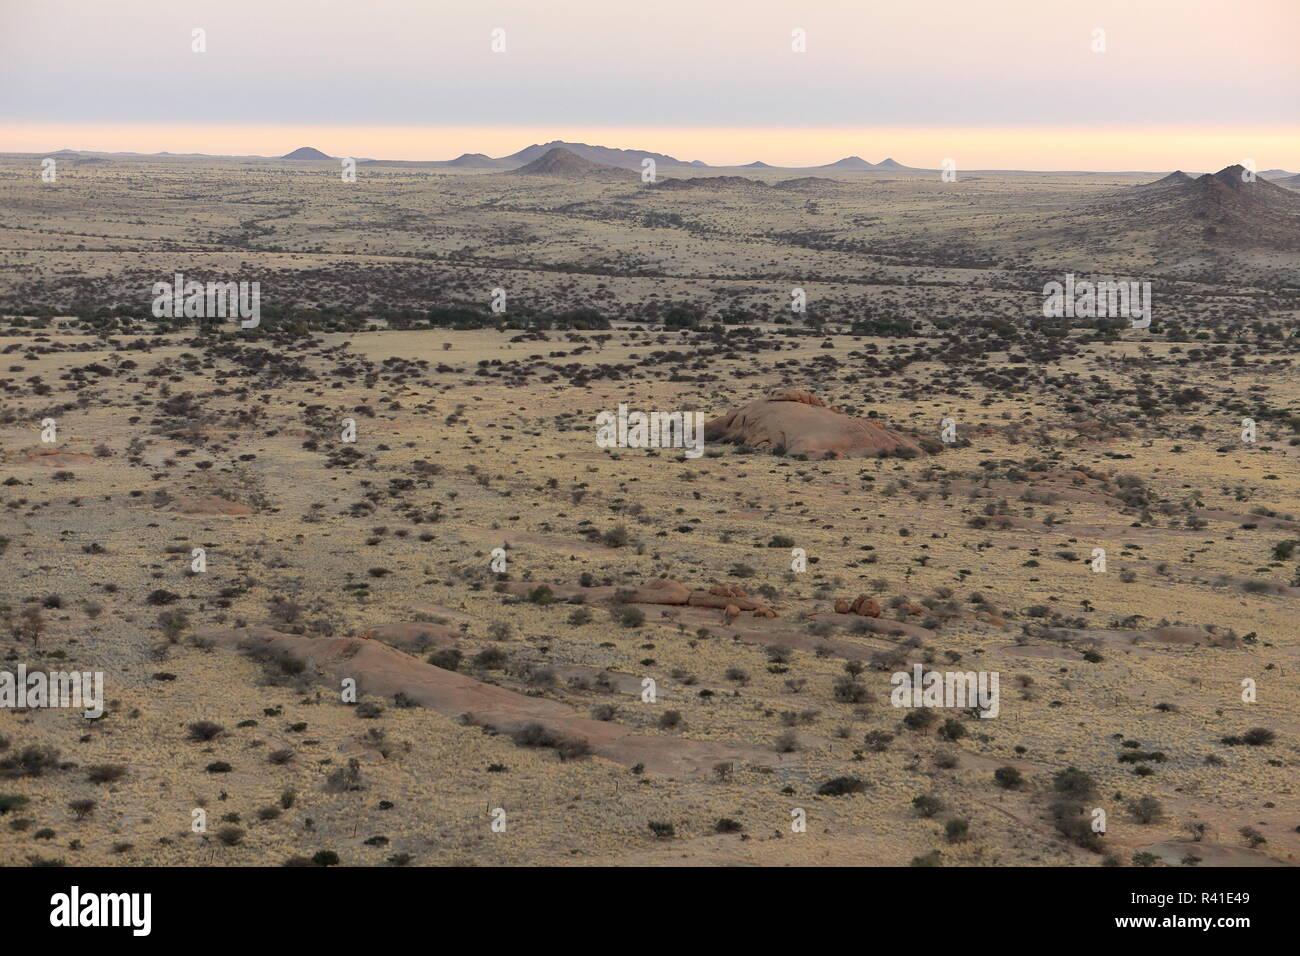 the savanna in namibia Stock Photo